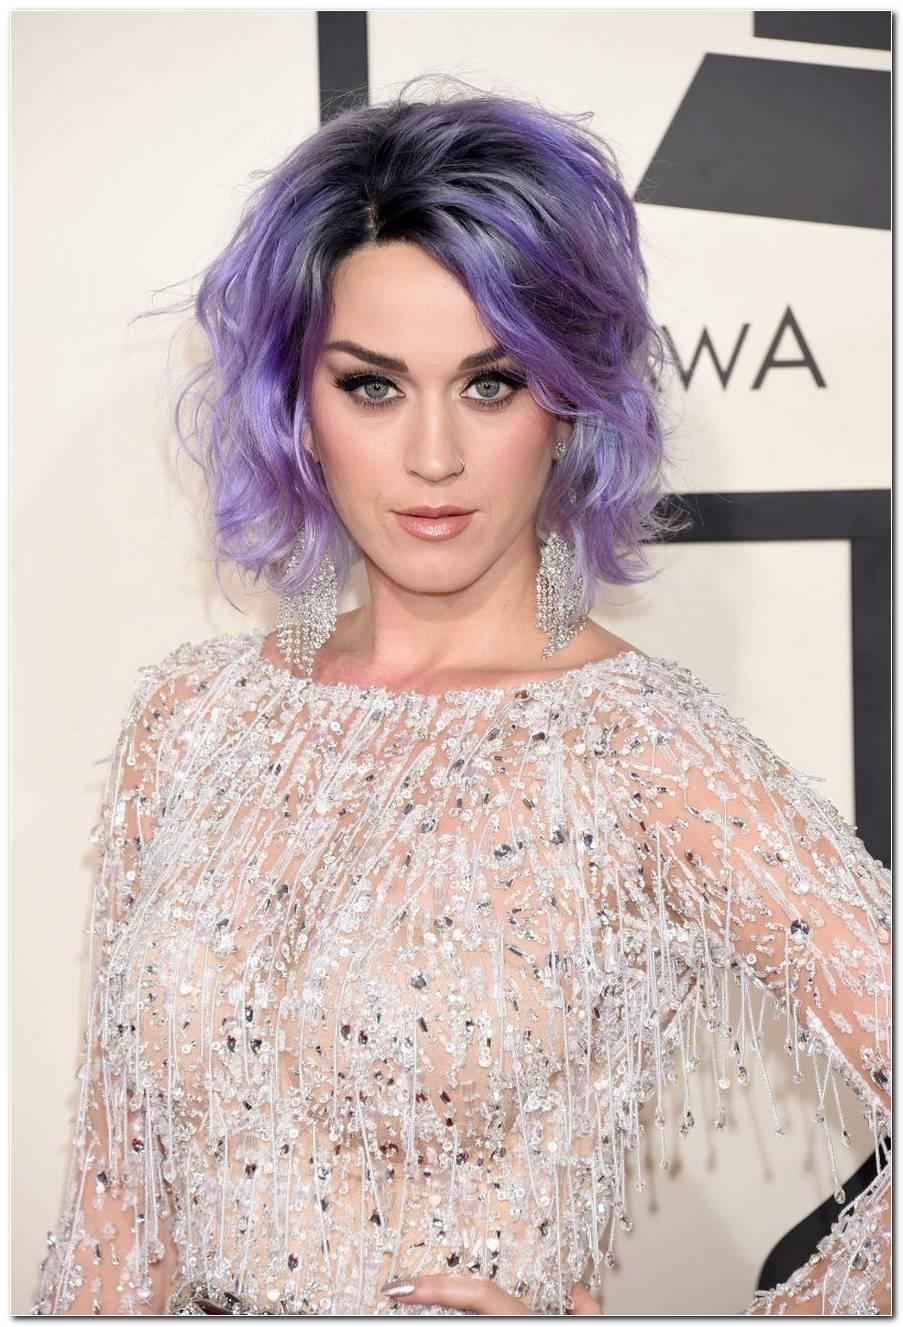 Katy Perry Frisuren Anleitung